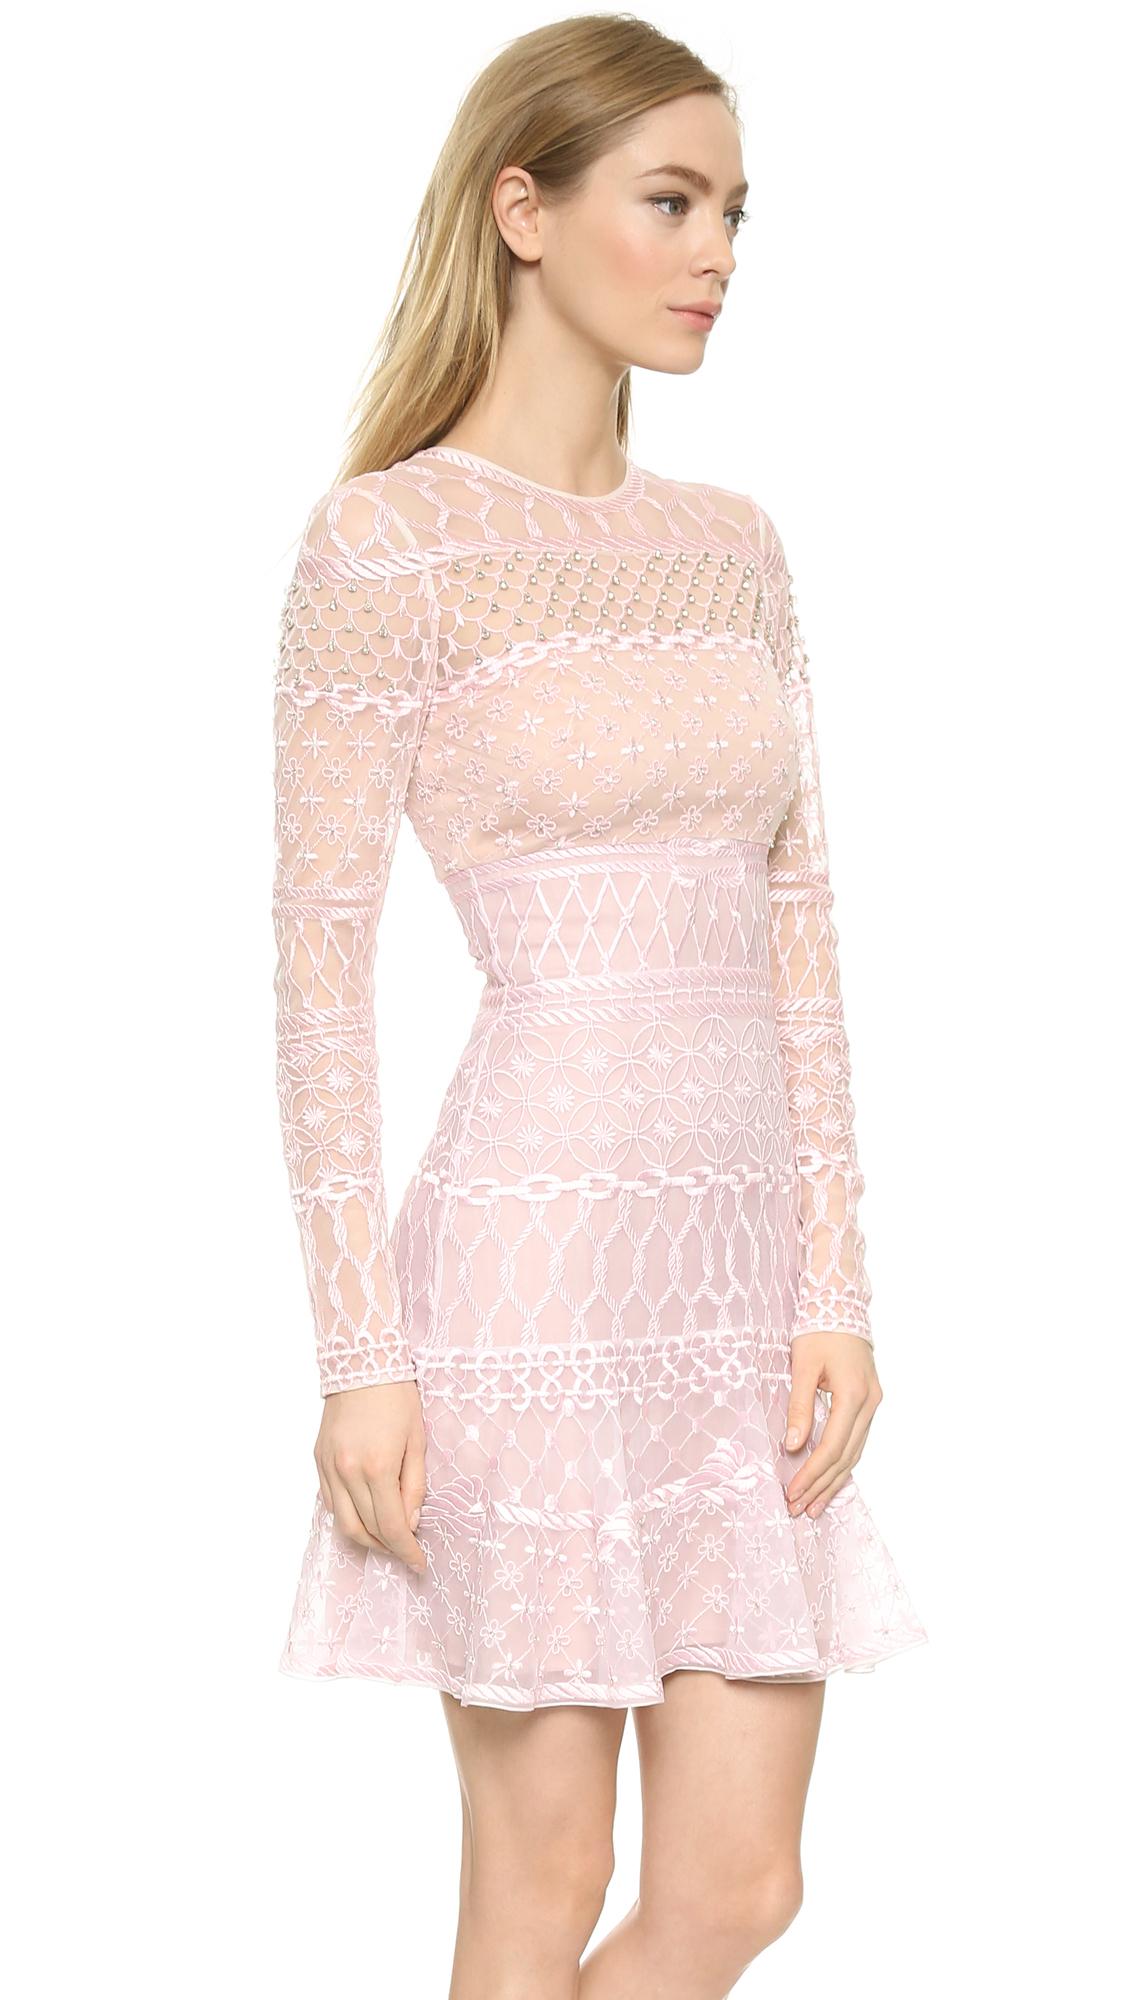 Temperley london Mini Fishnet Dress - Pink Mix in Pink | Lyst